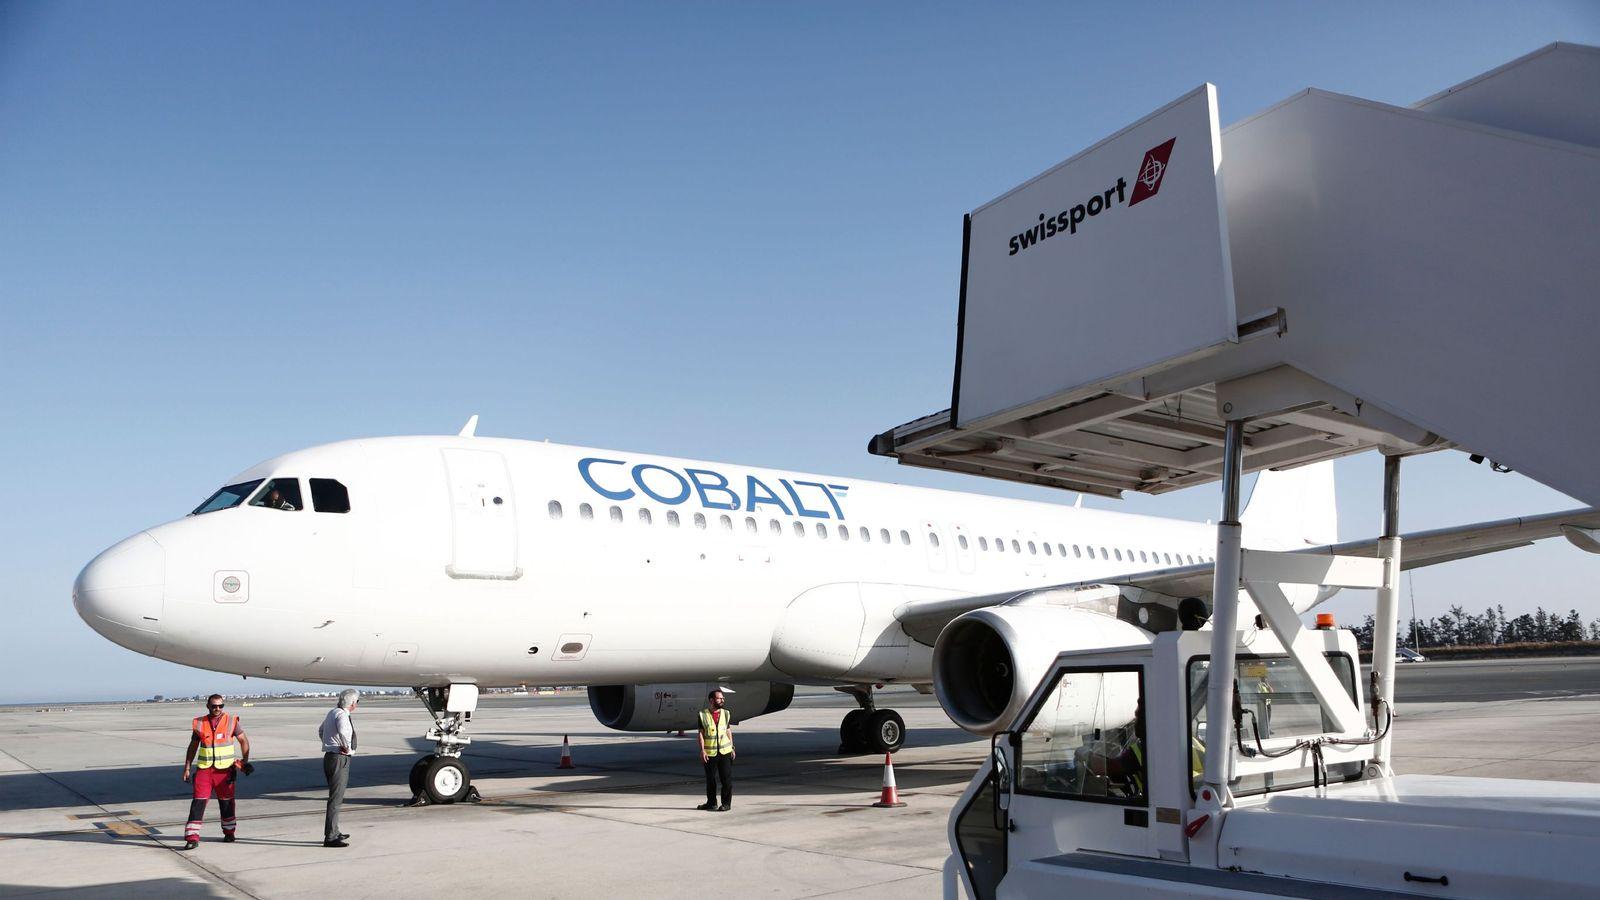 Passengers warned as airline suspends flights